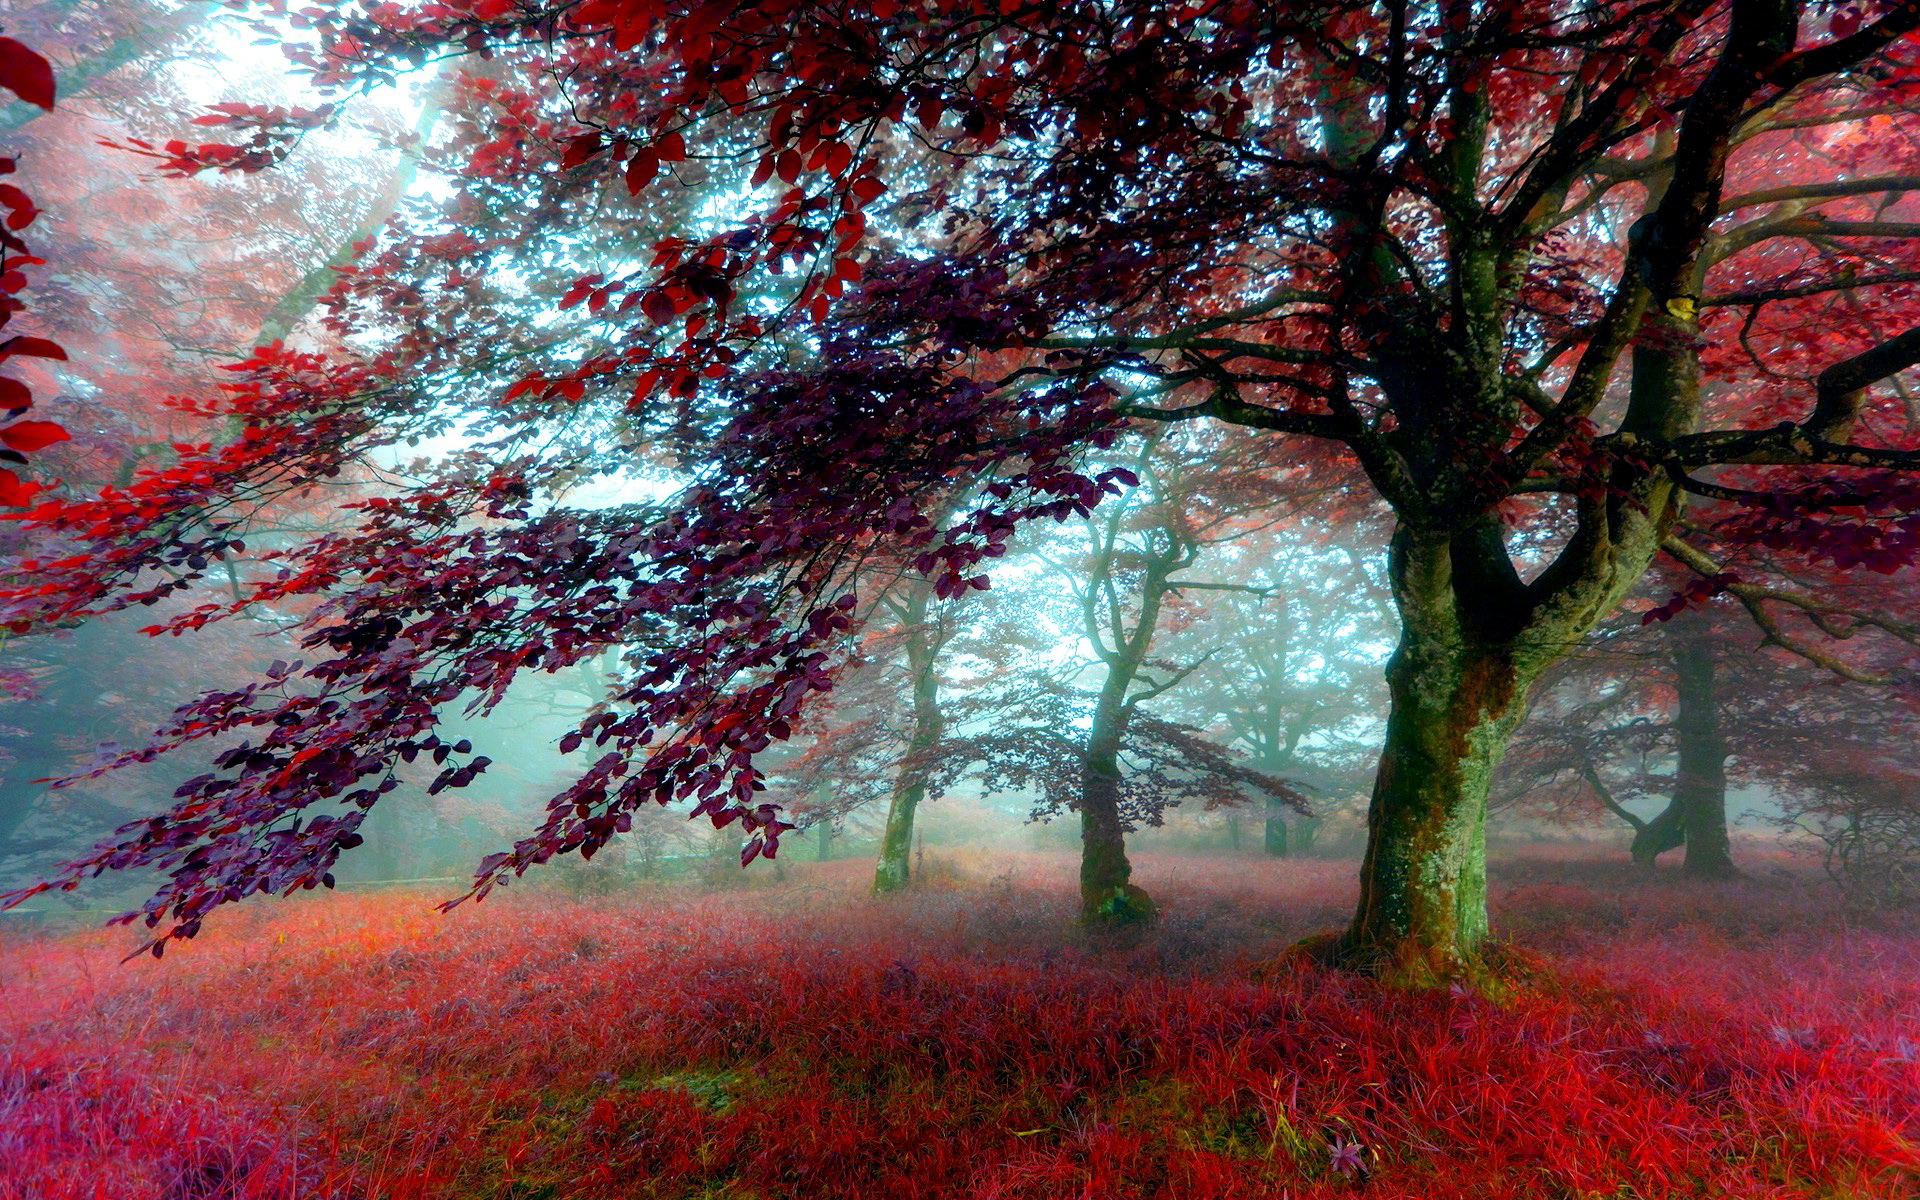 Red Autumn Scenery